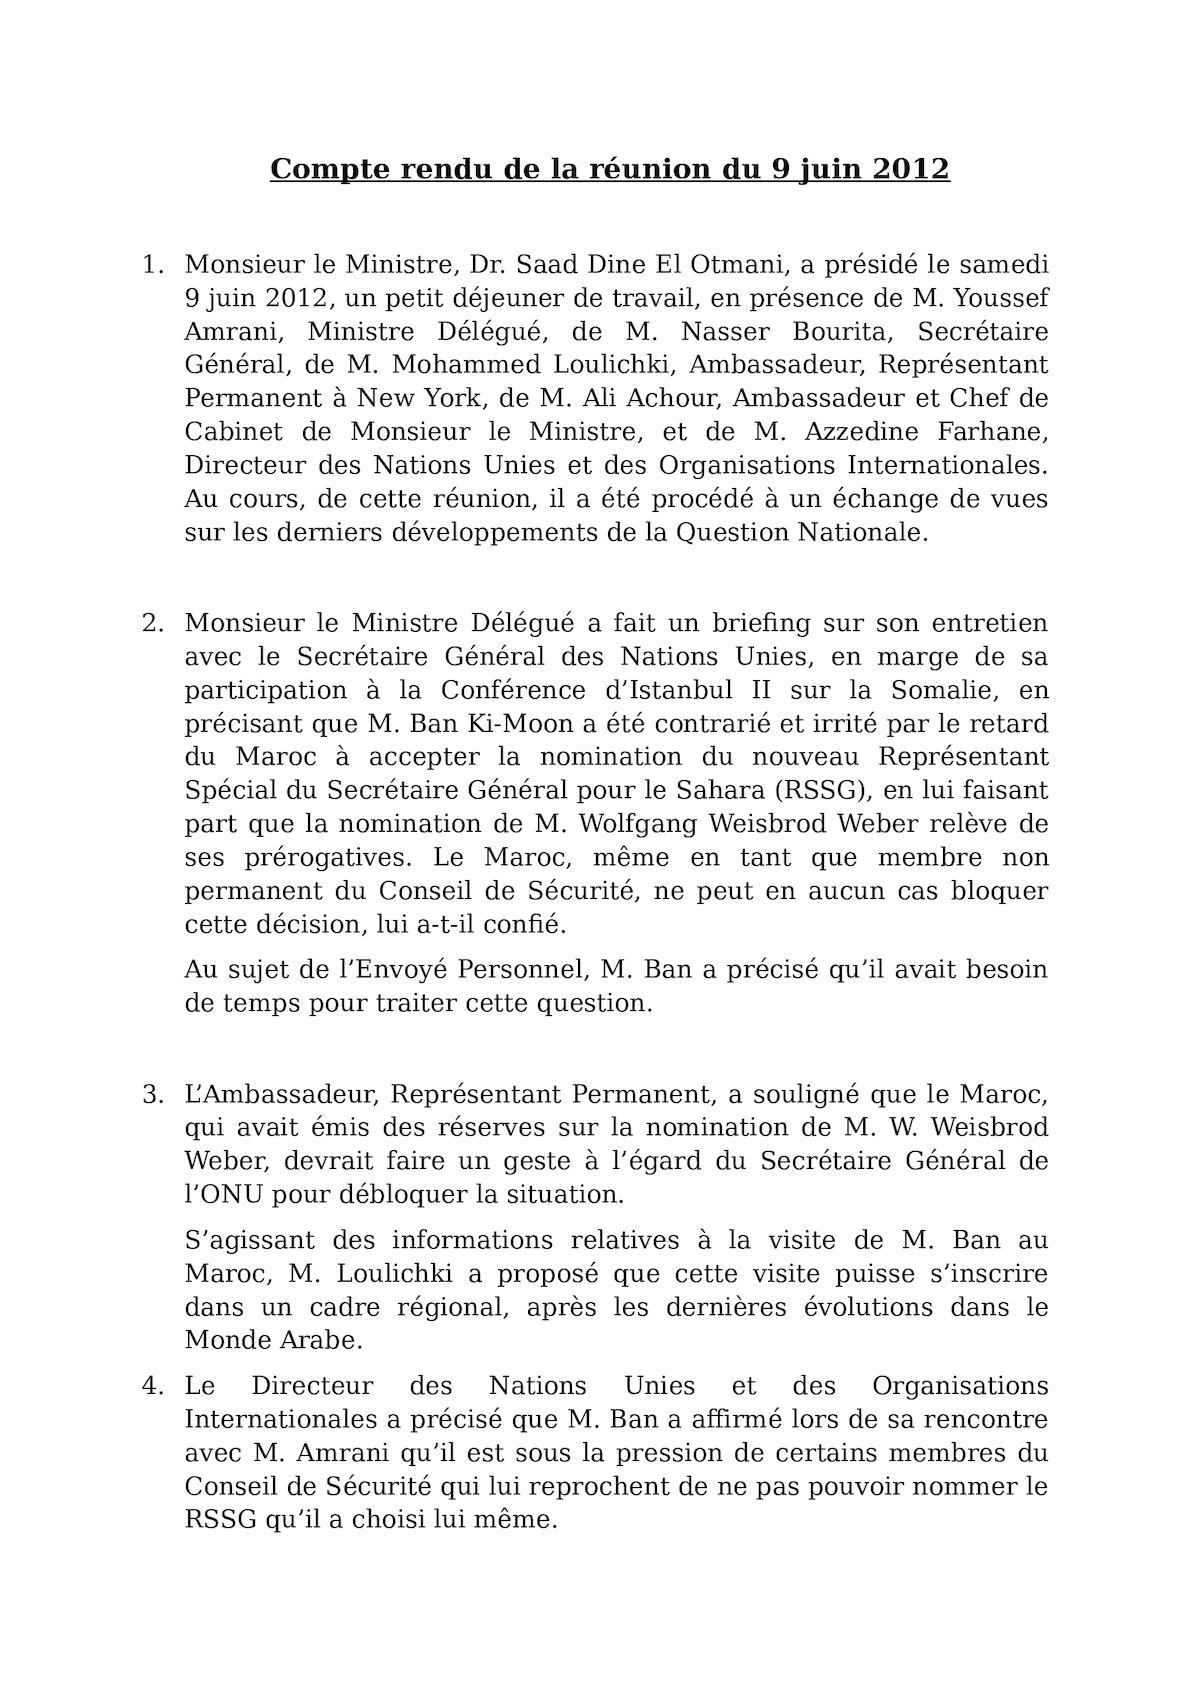 Compte Rendu De La Réunion Du 9 Juin 2012